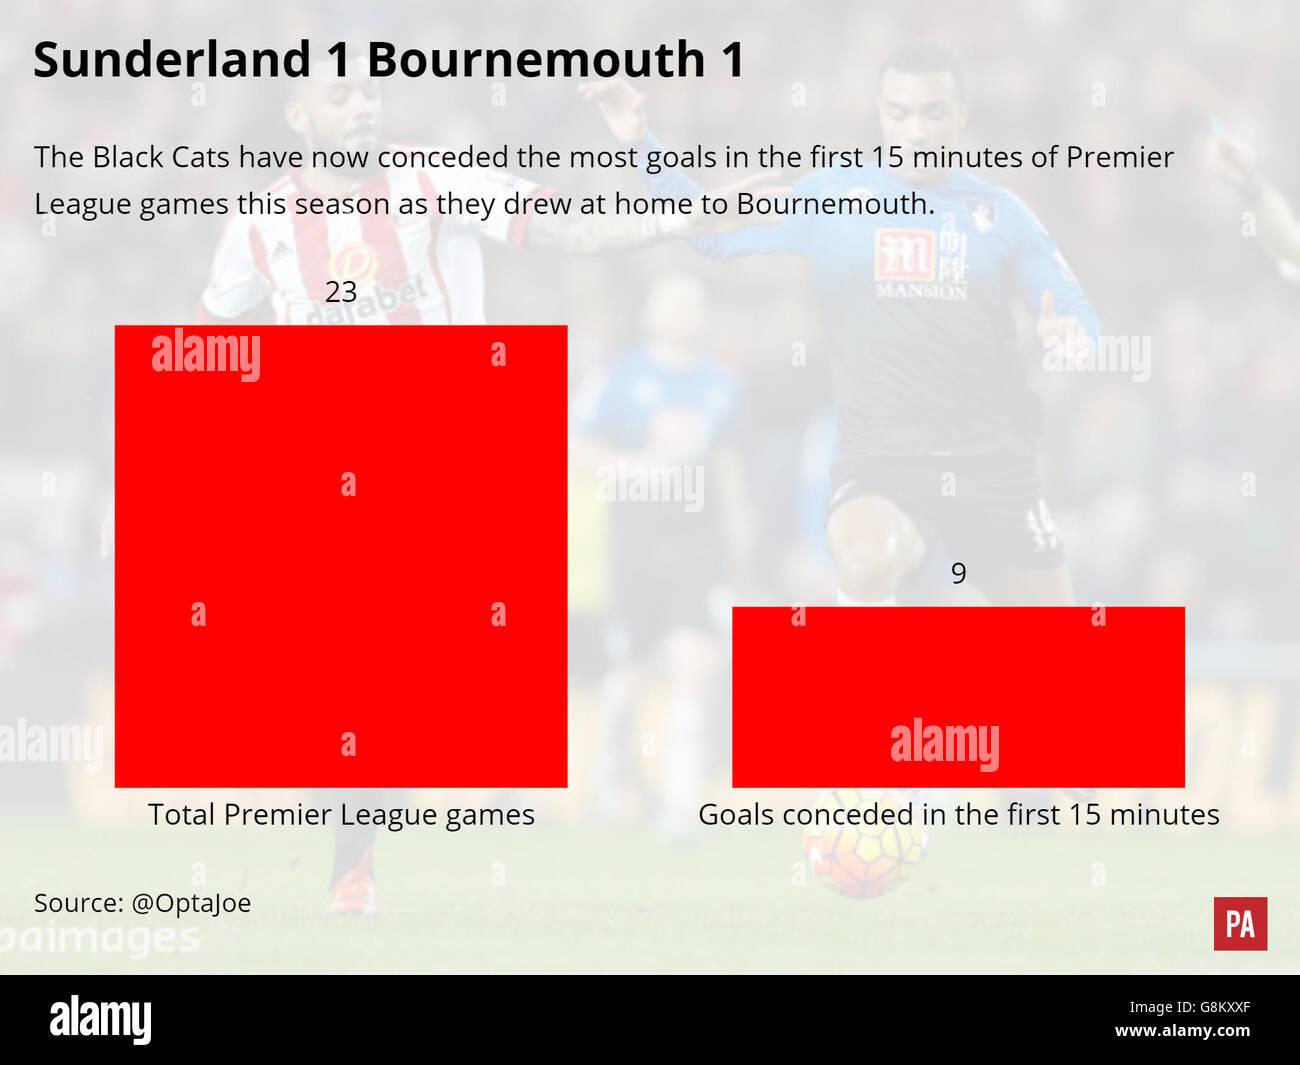 Soccer - Sunderland v AFC Bournemouth Match Graphic - Stock Image